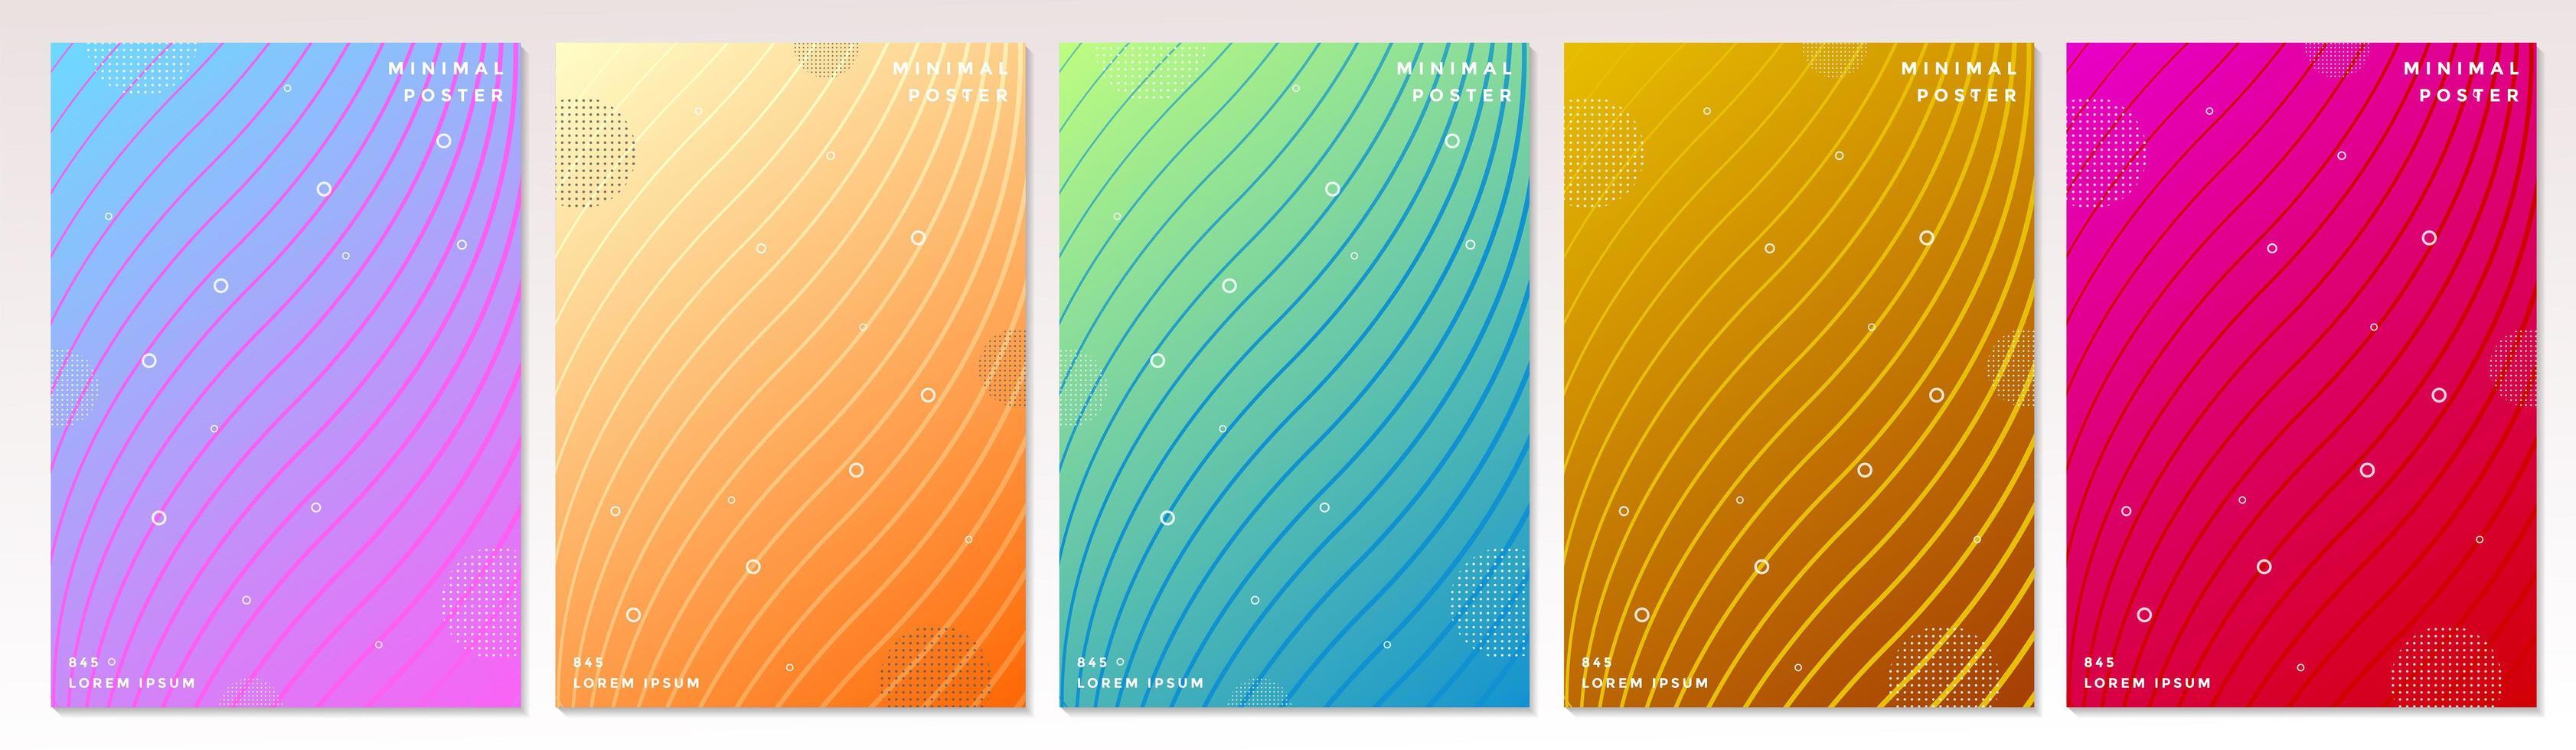 copertine minimal colorate luminose astratte vettore